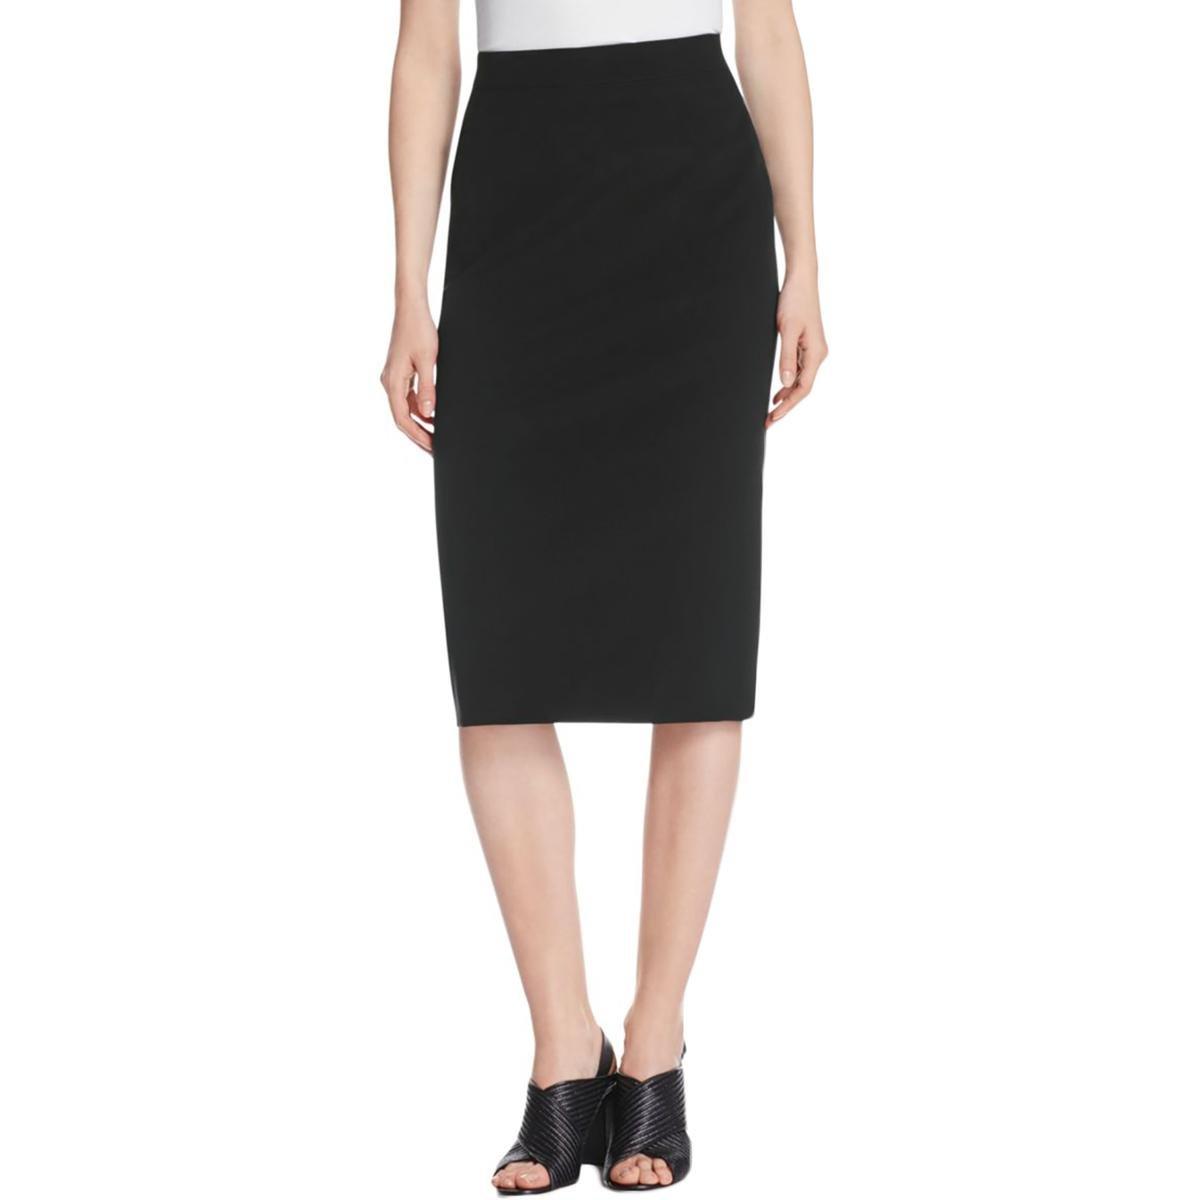 DKNY Womens Back Slit Seam Detail Pencil Skirt Black 4 by DKNY